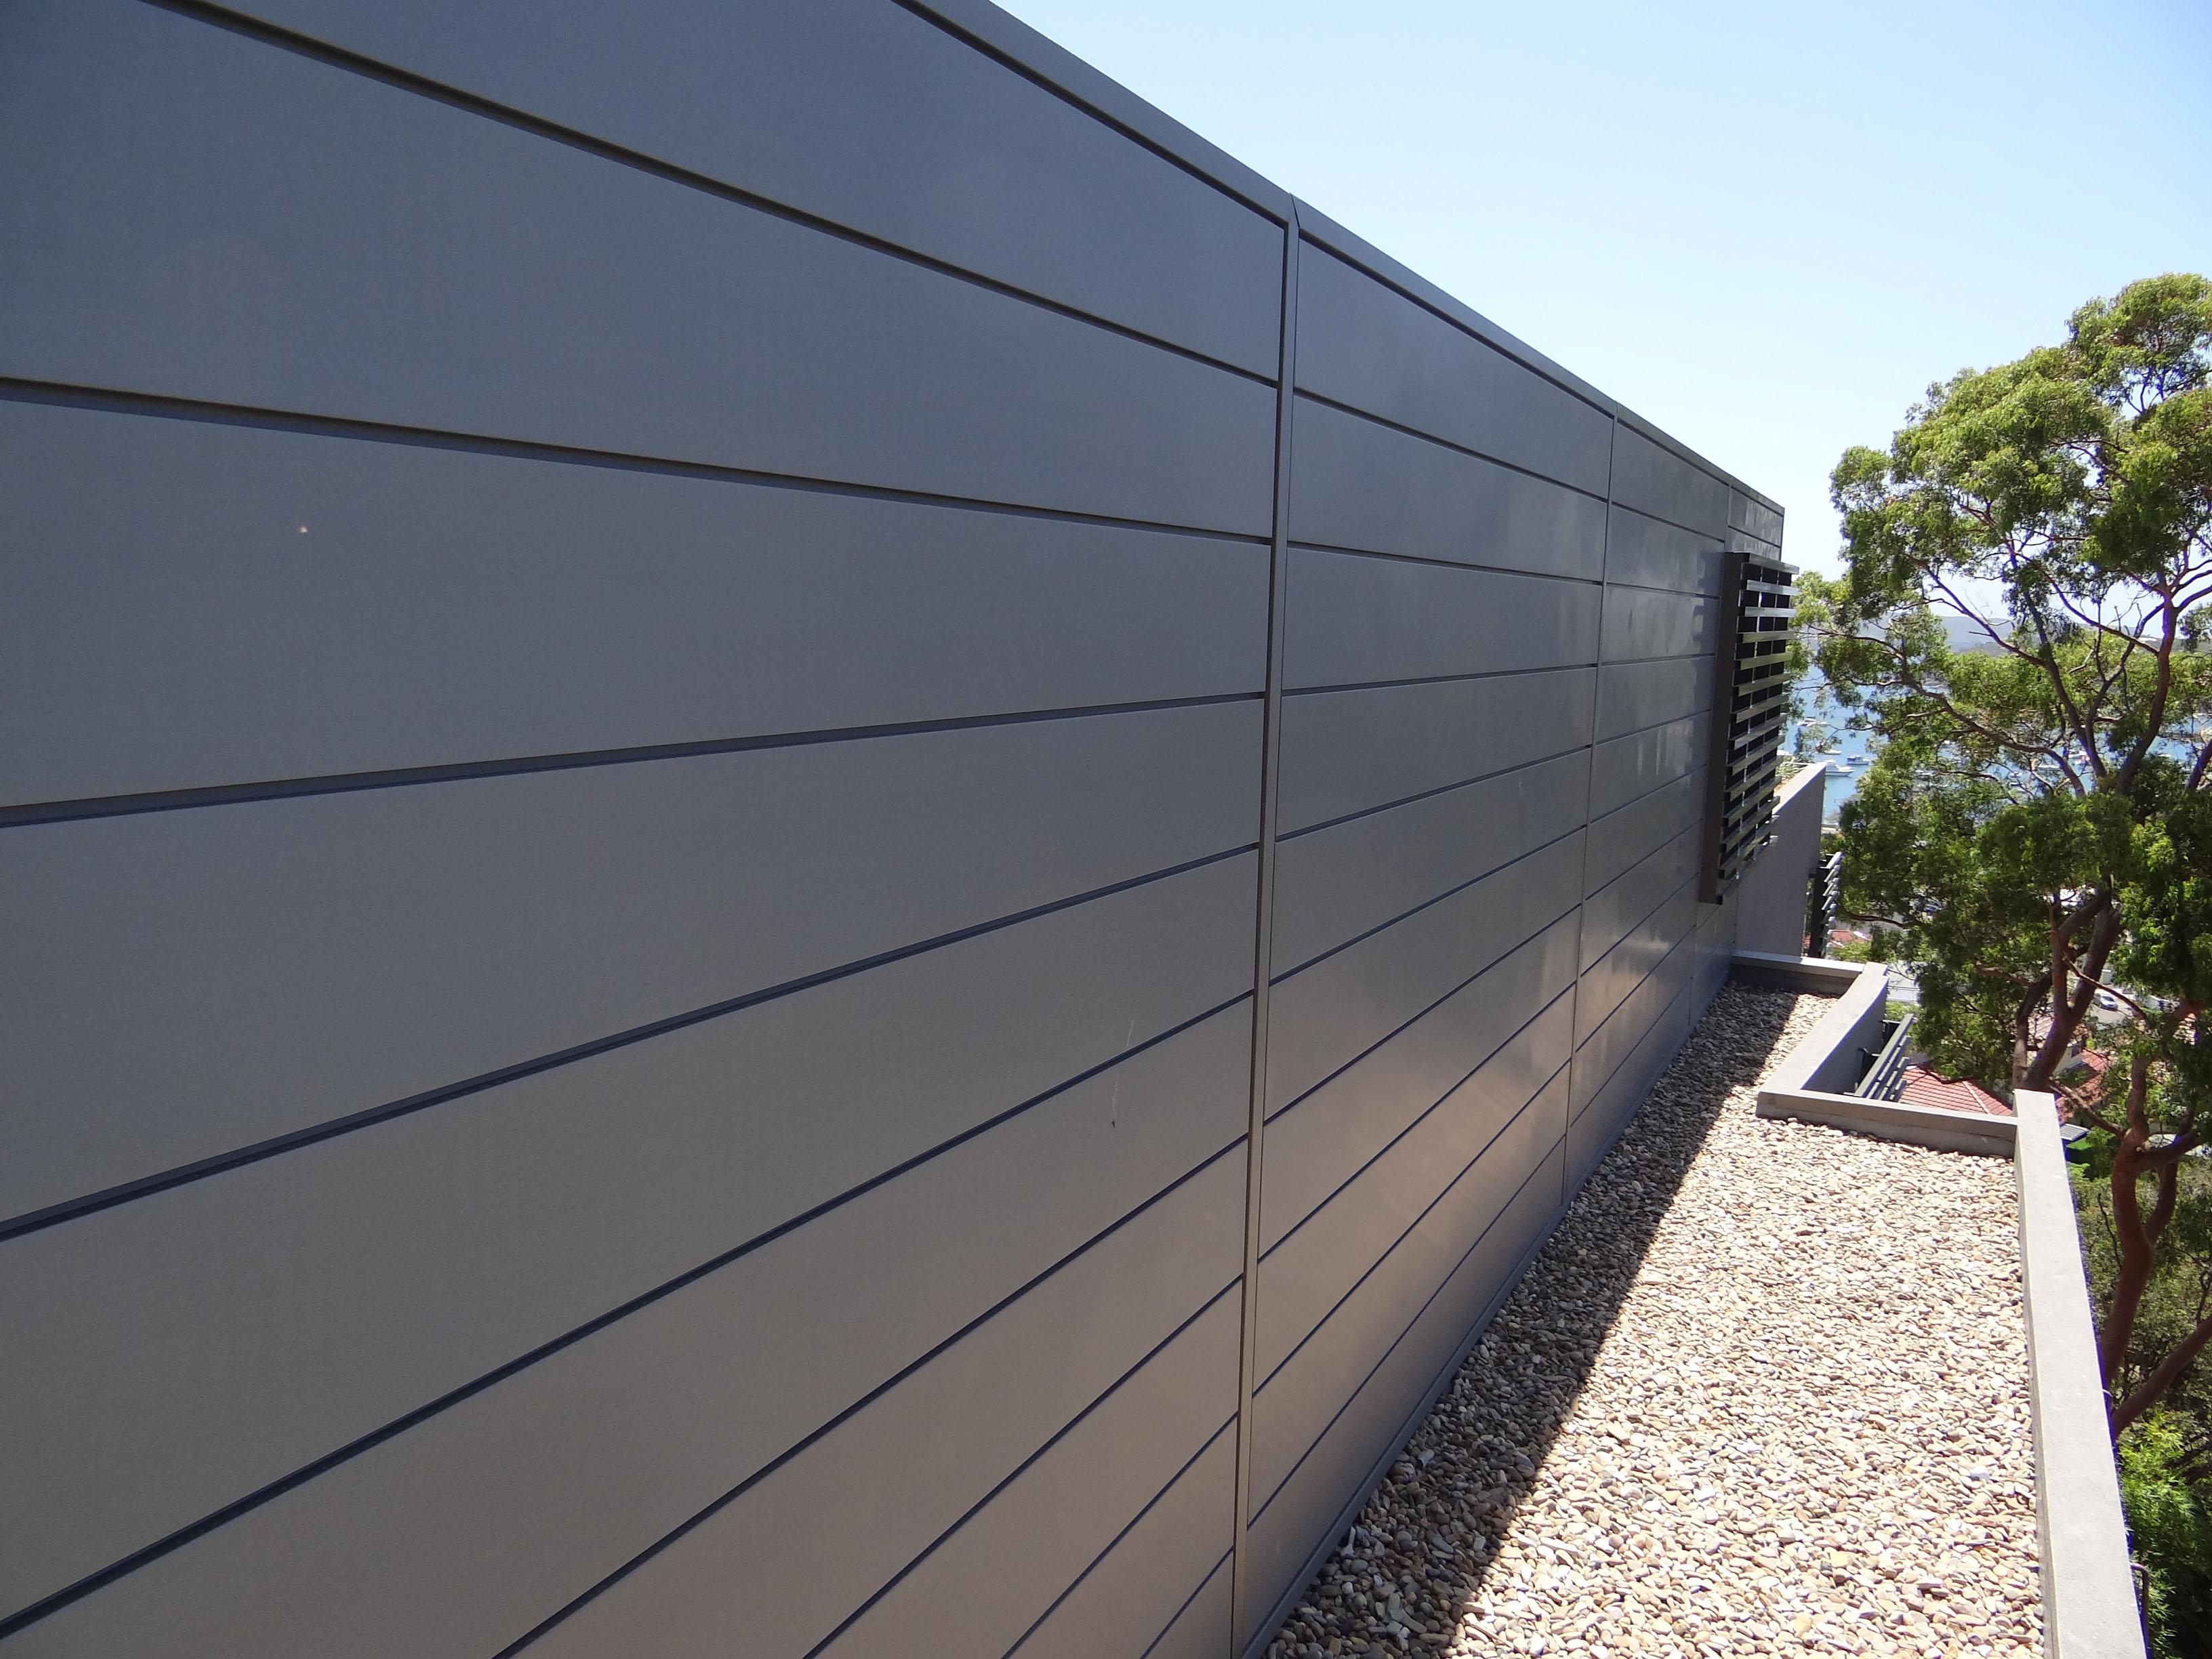 Zinc Amp Aluminium Roofing Installation In Sydney